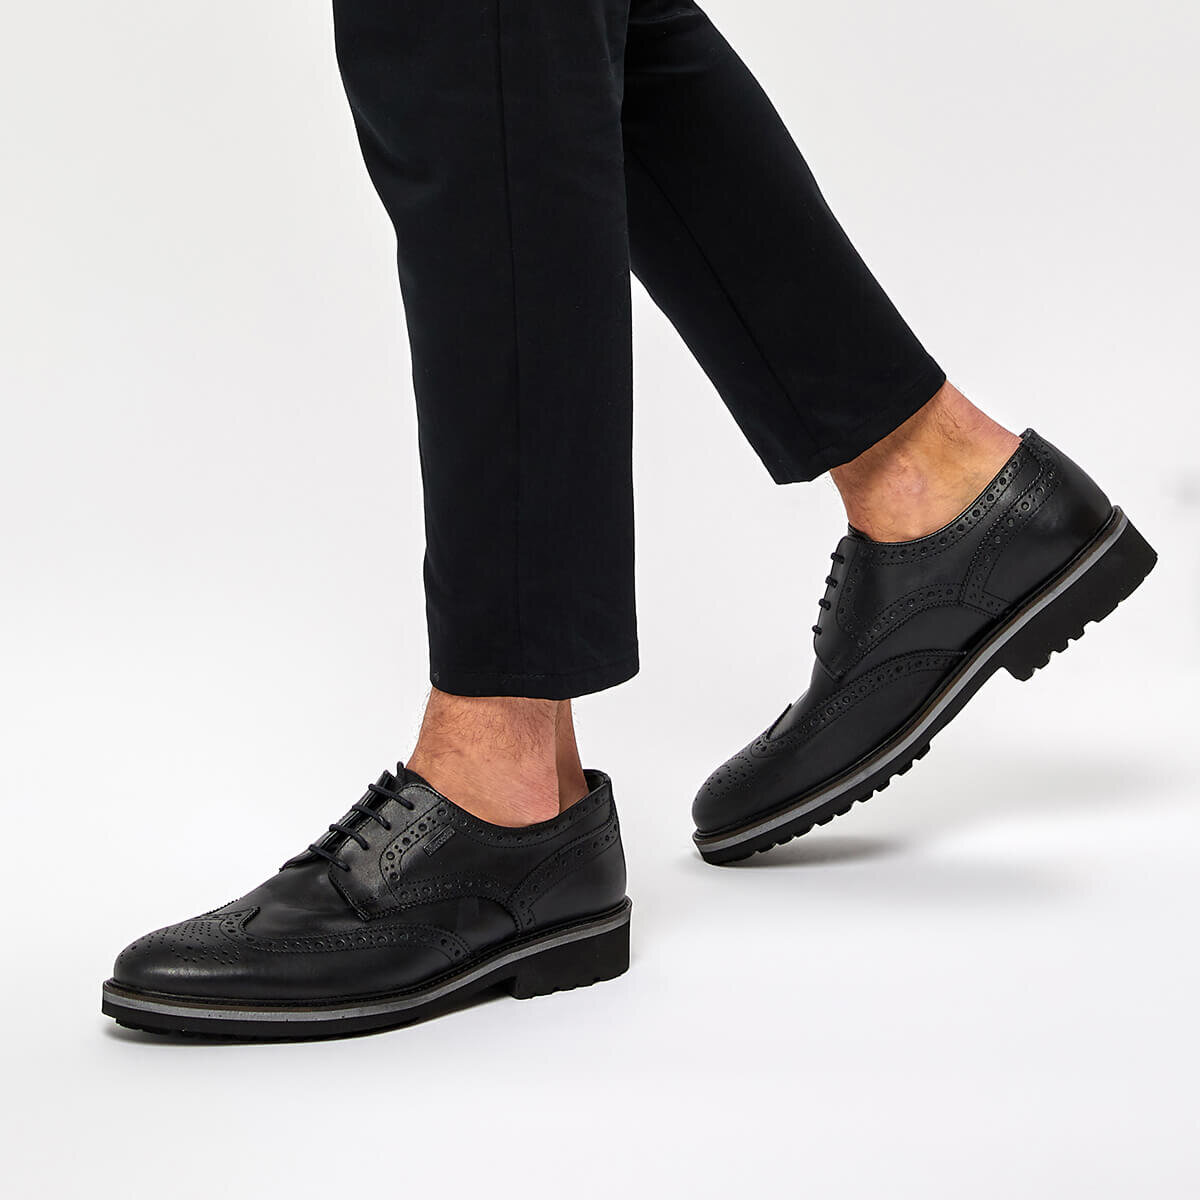 Mercedes RAHAL Siyah Erkek Klasik Ayakkabı 100337567 | Flo